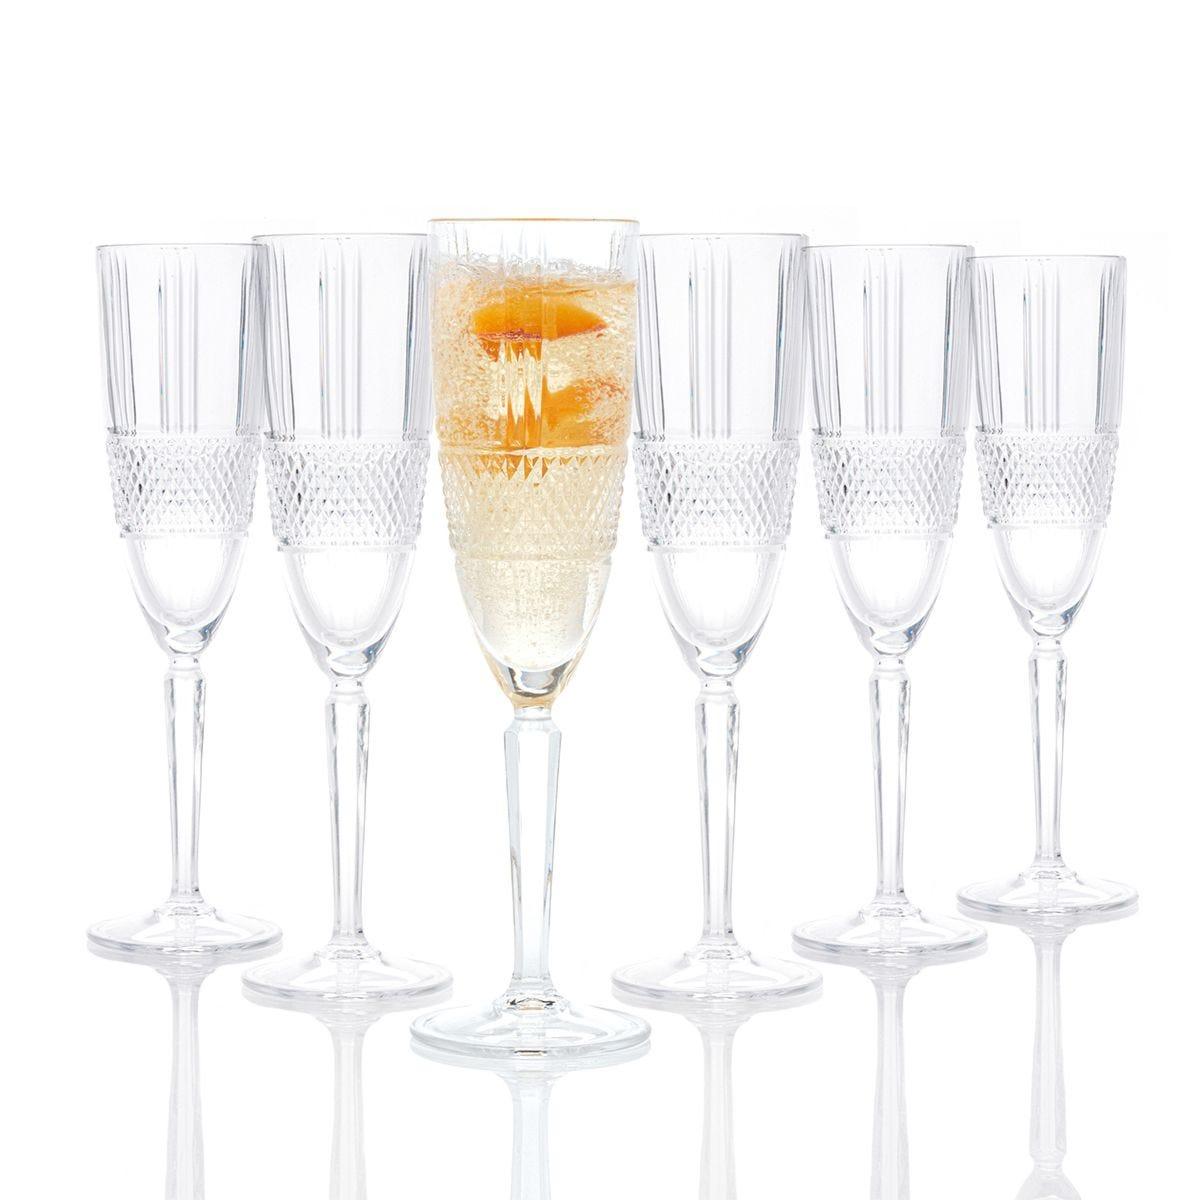 RCR Brilliante Crystal Champagne  Flutes - Set of 6